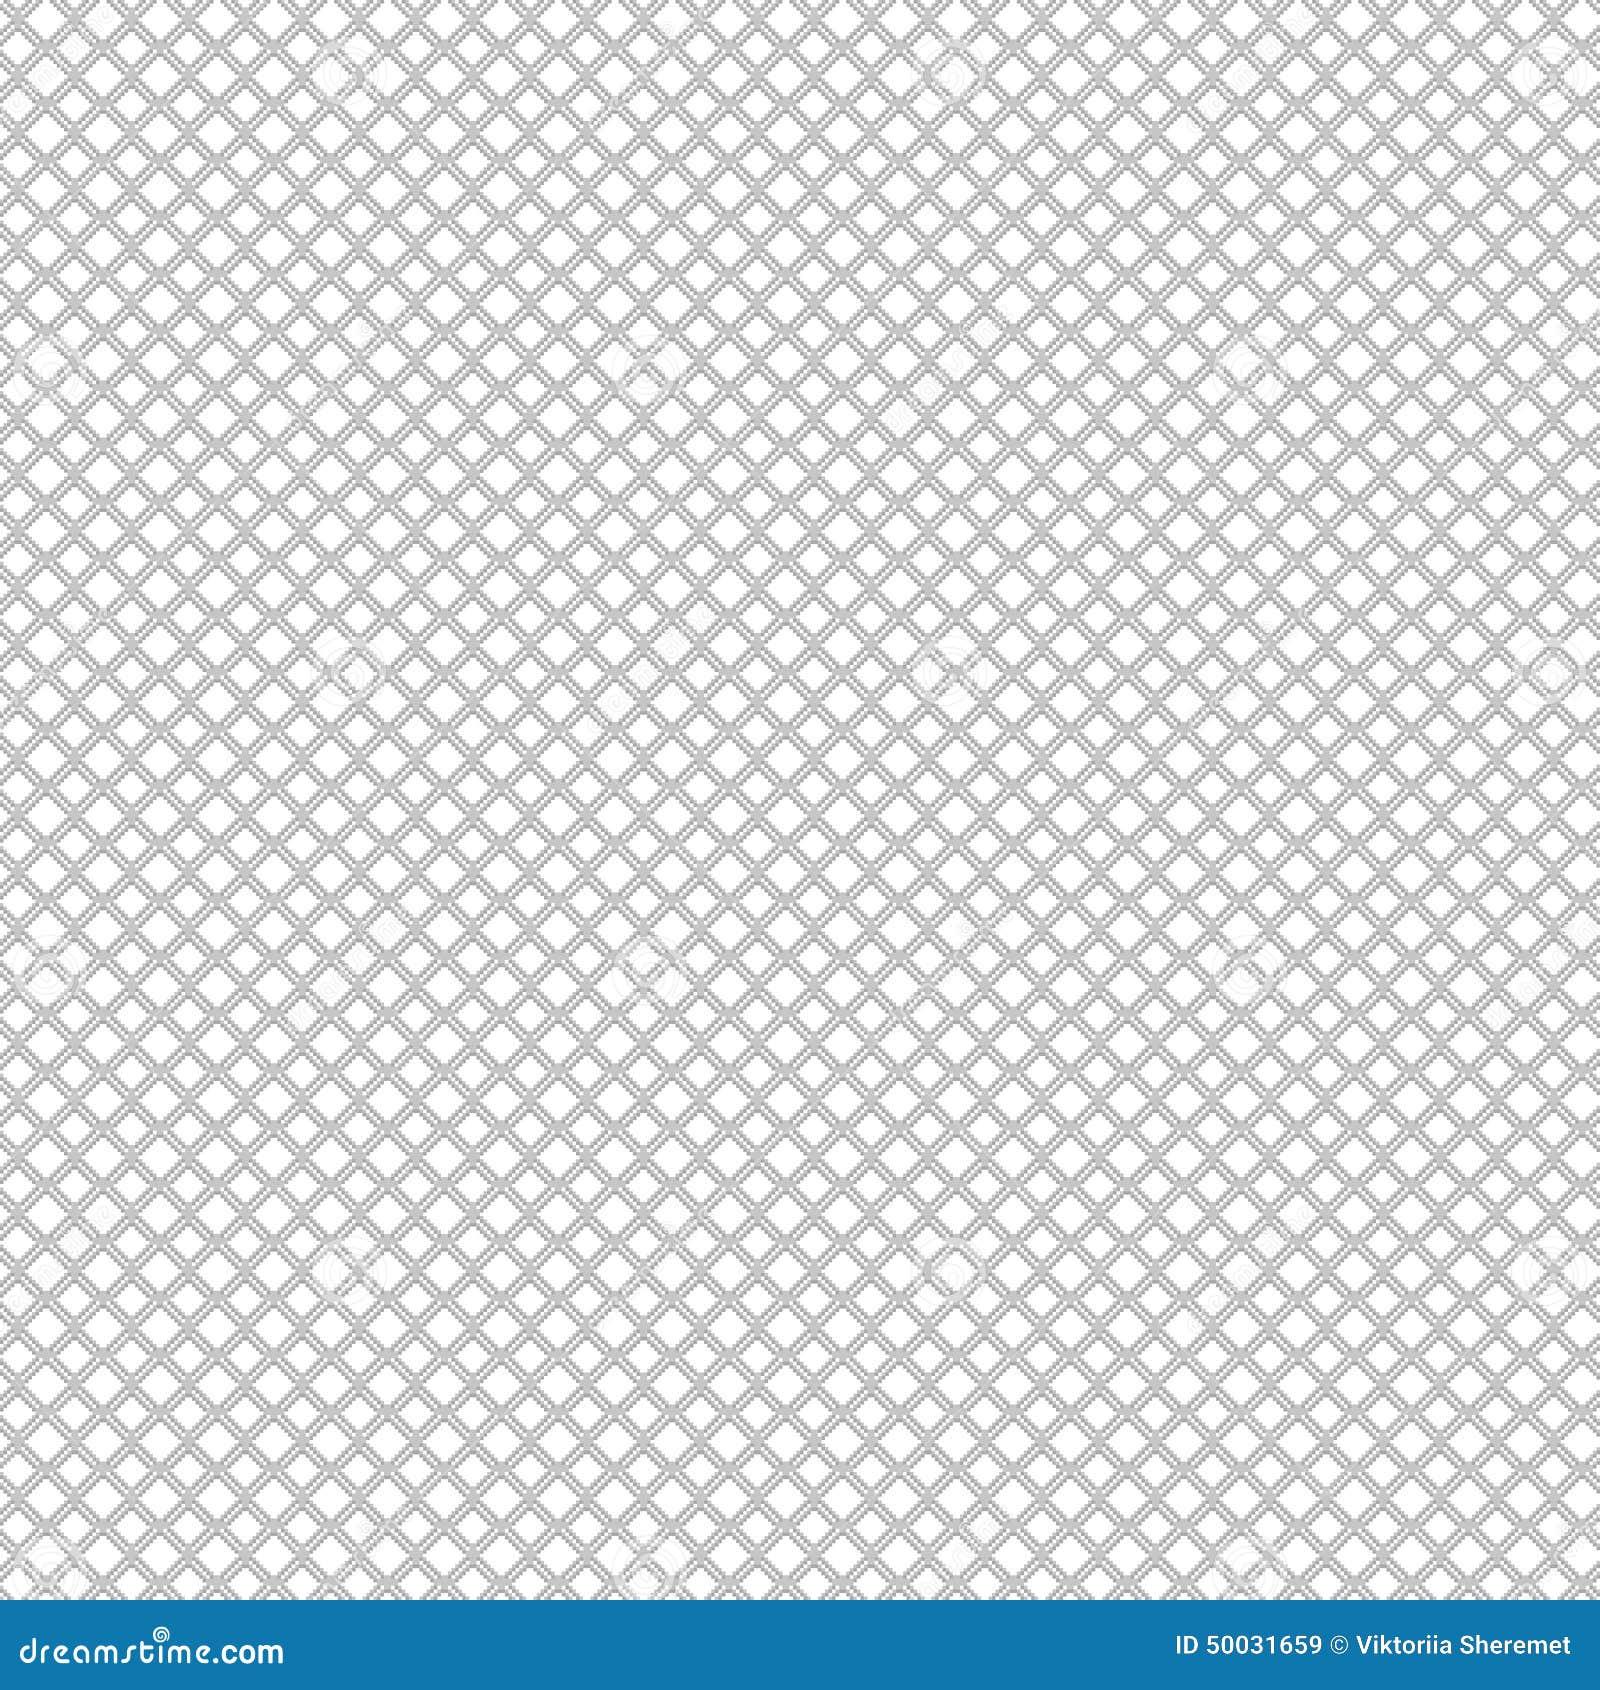 Pixel Subtle Texture Grid Background. Vector Seamless